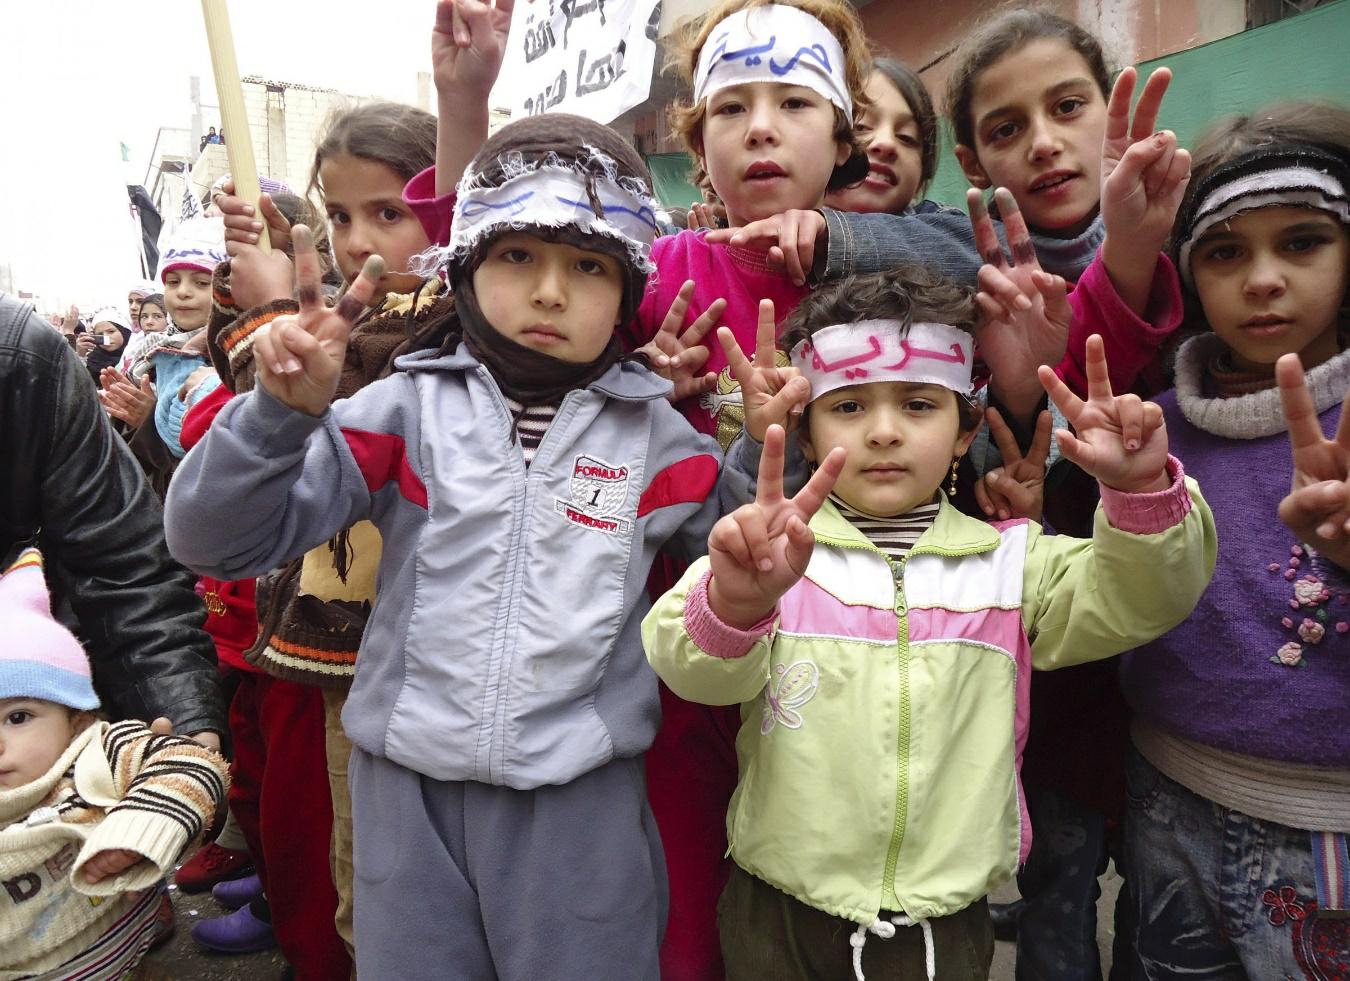 syria protest 2011